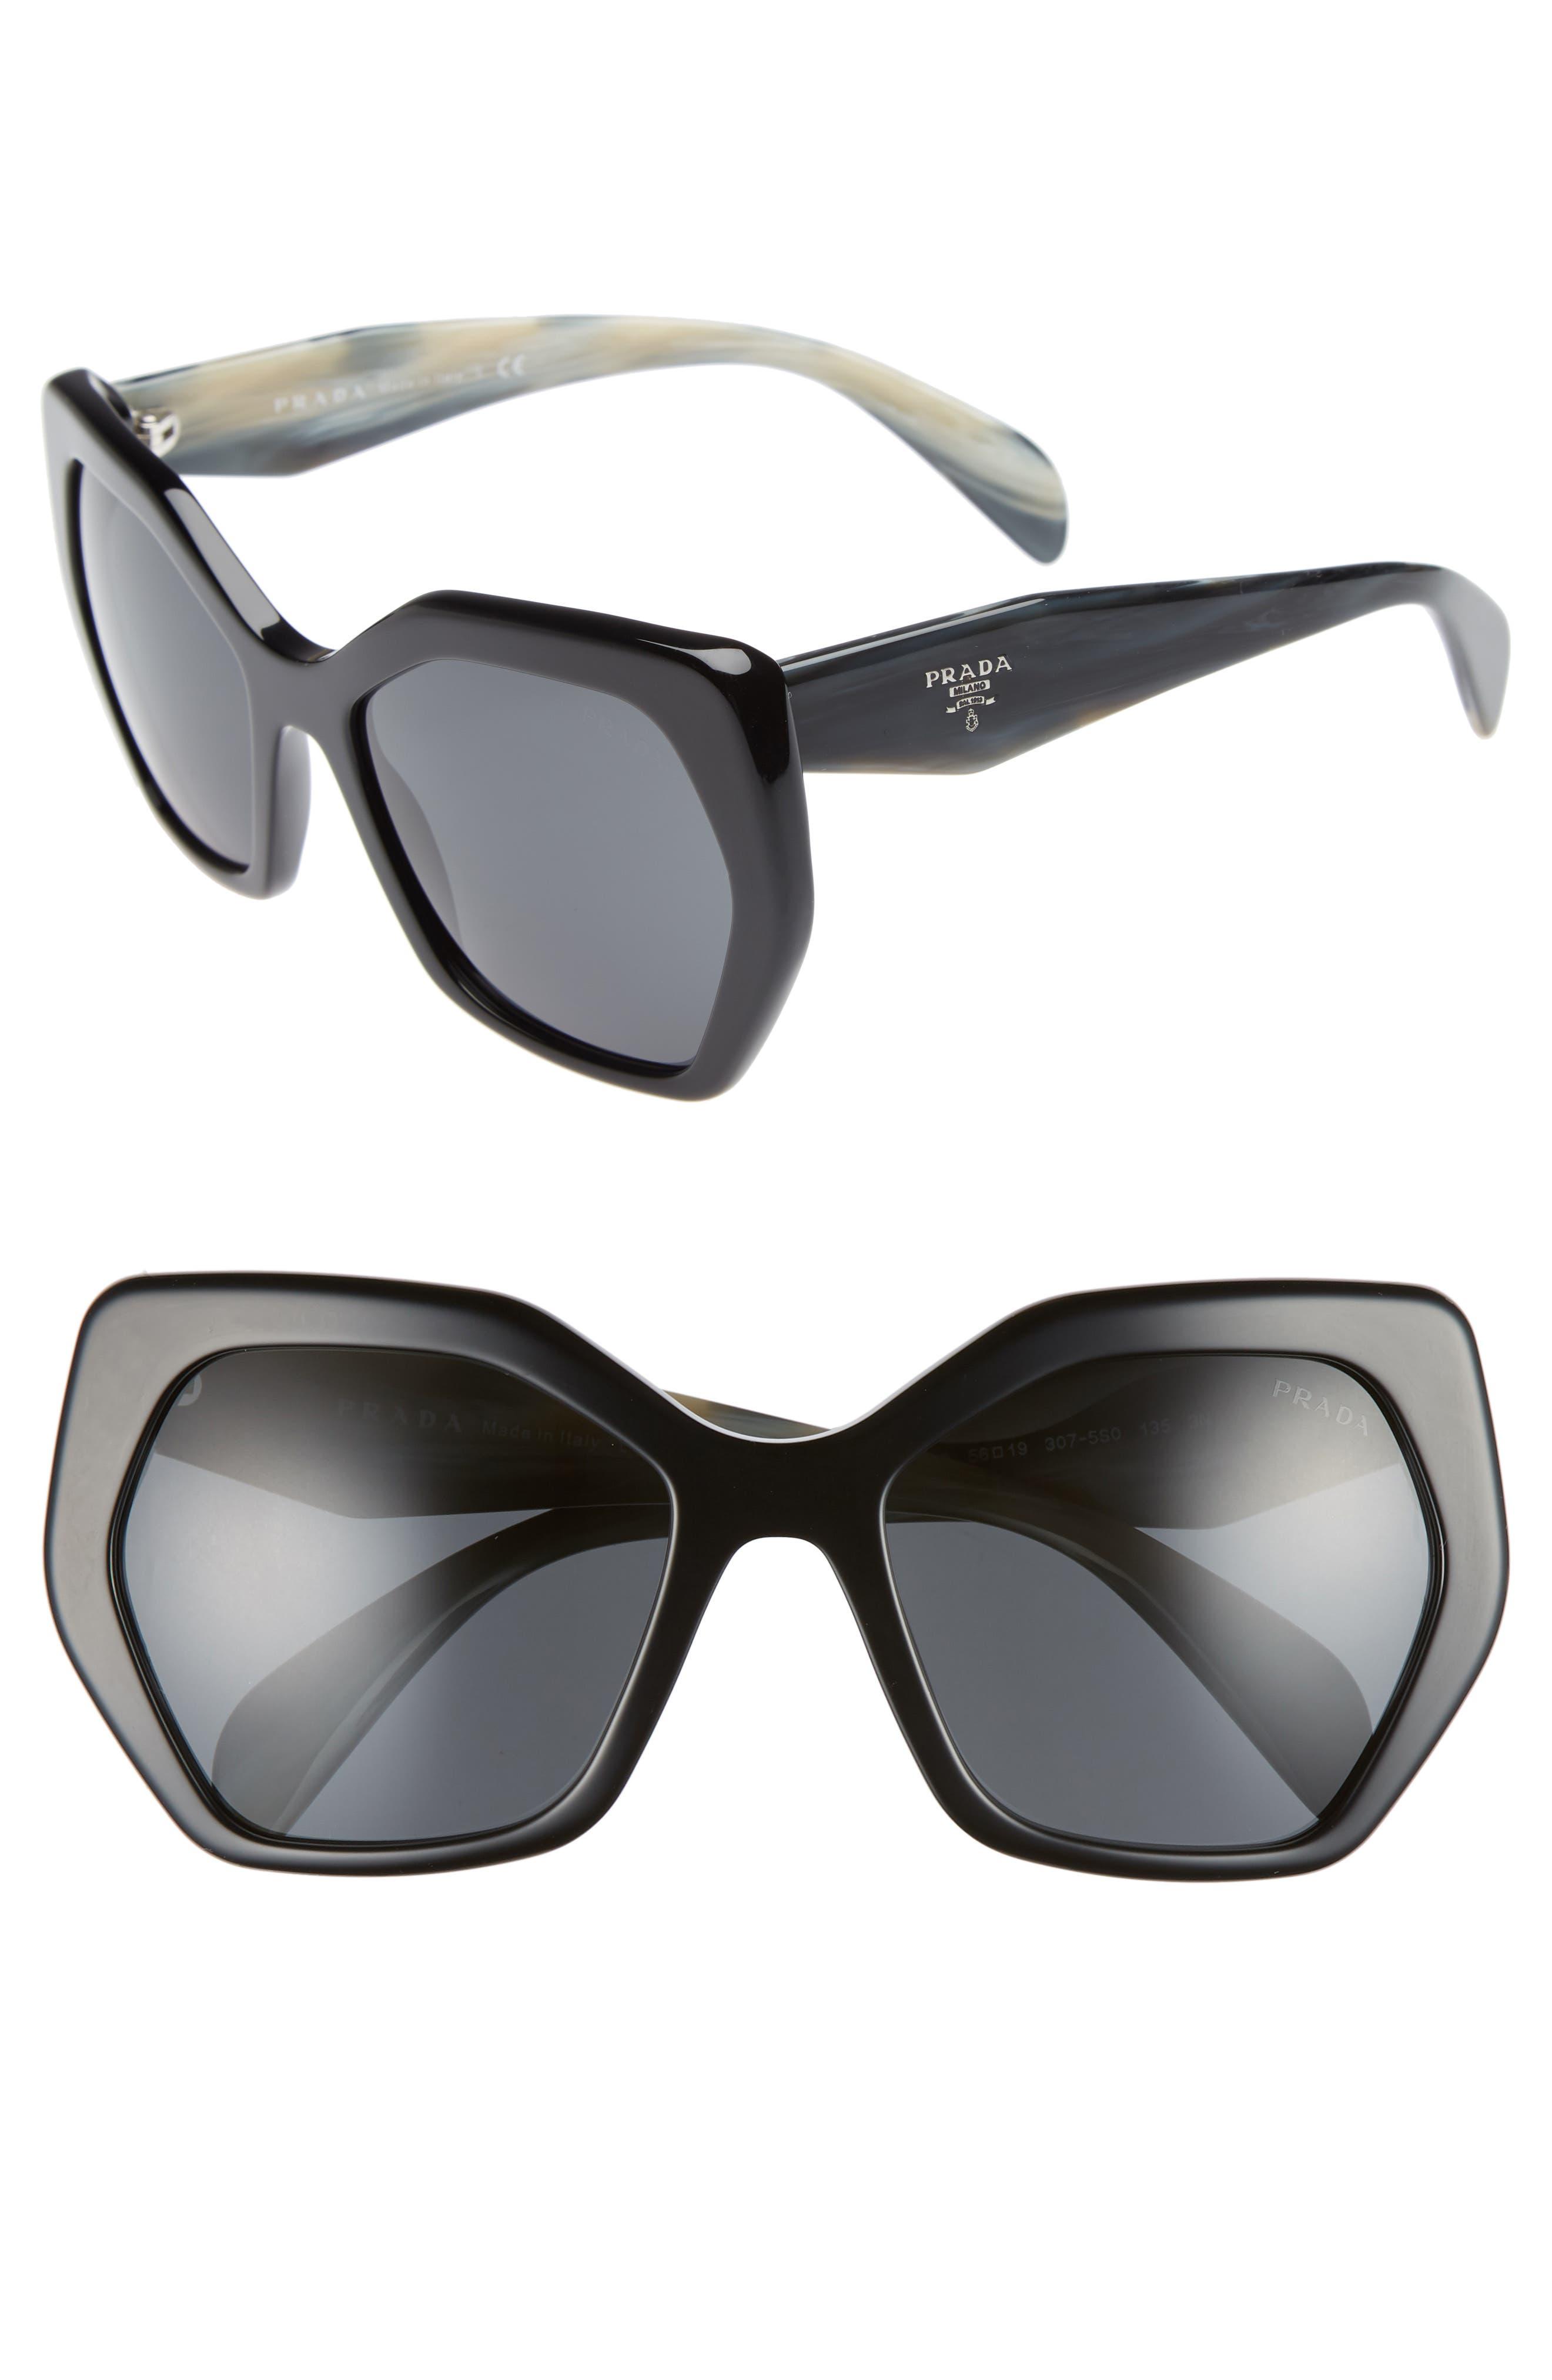 Heritage 56mm Sunglasses,                             Main thumbnail 1, color,                             BLACK SOLID